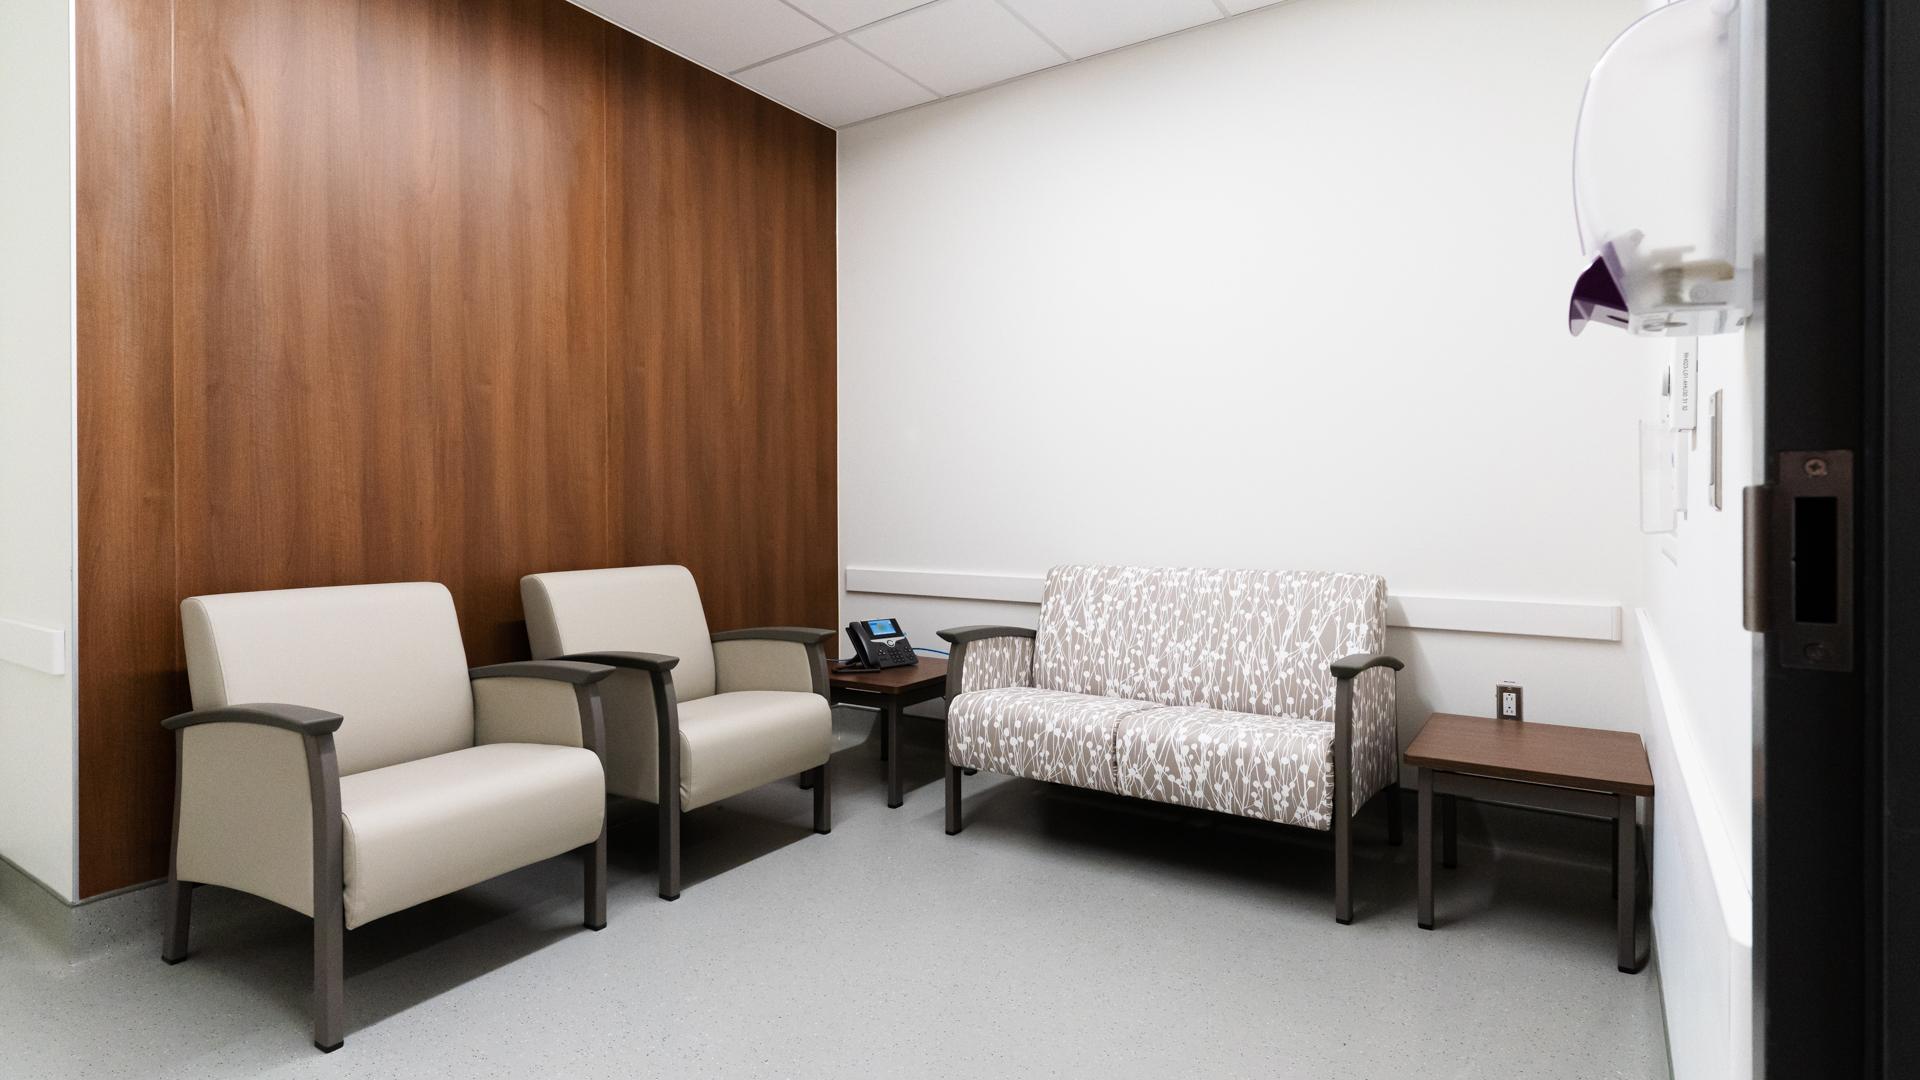 Family Quite Room - ER Acute Care